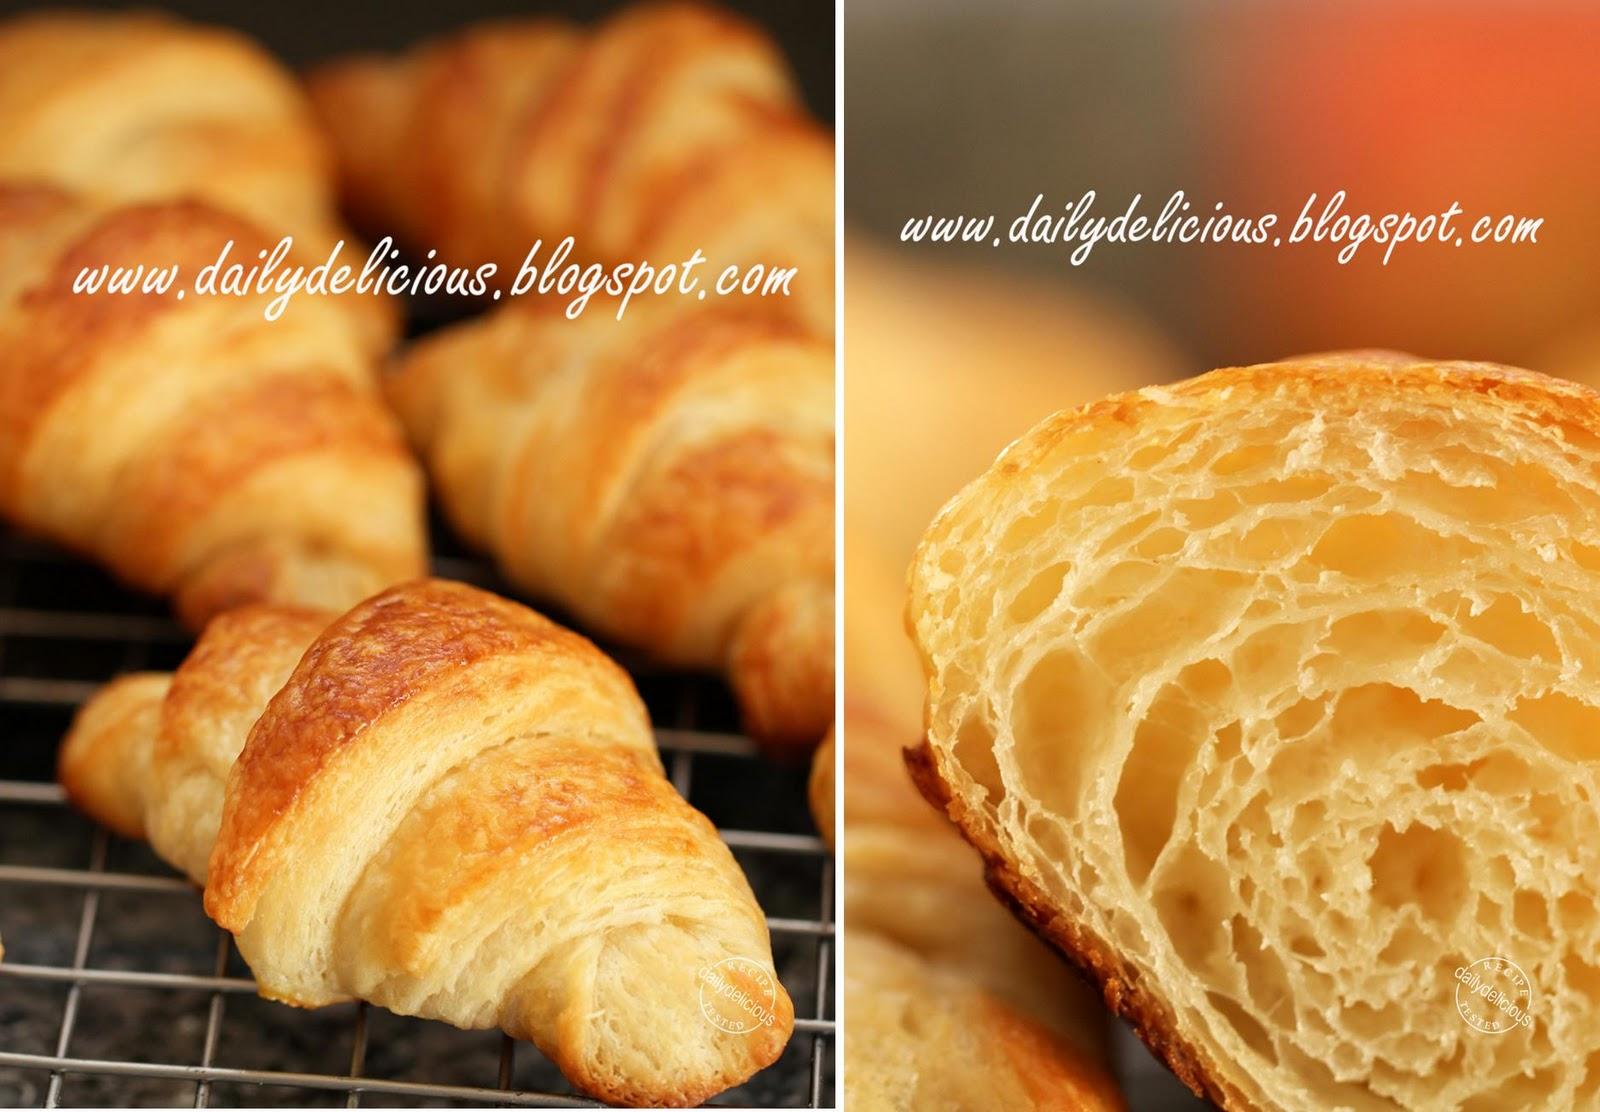 dailydelicious September 2011 Daring Bakers Challenge